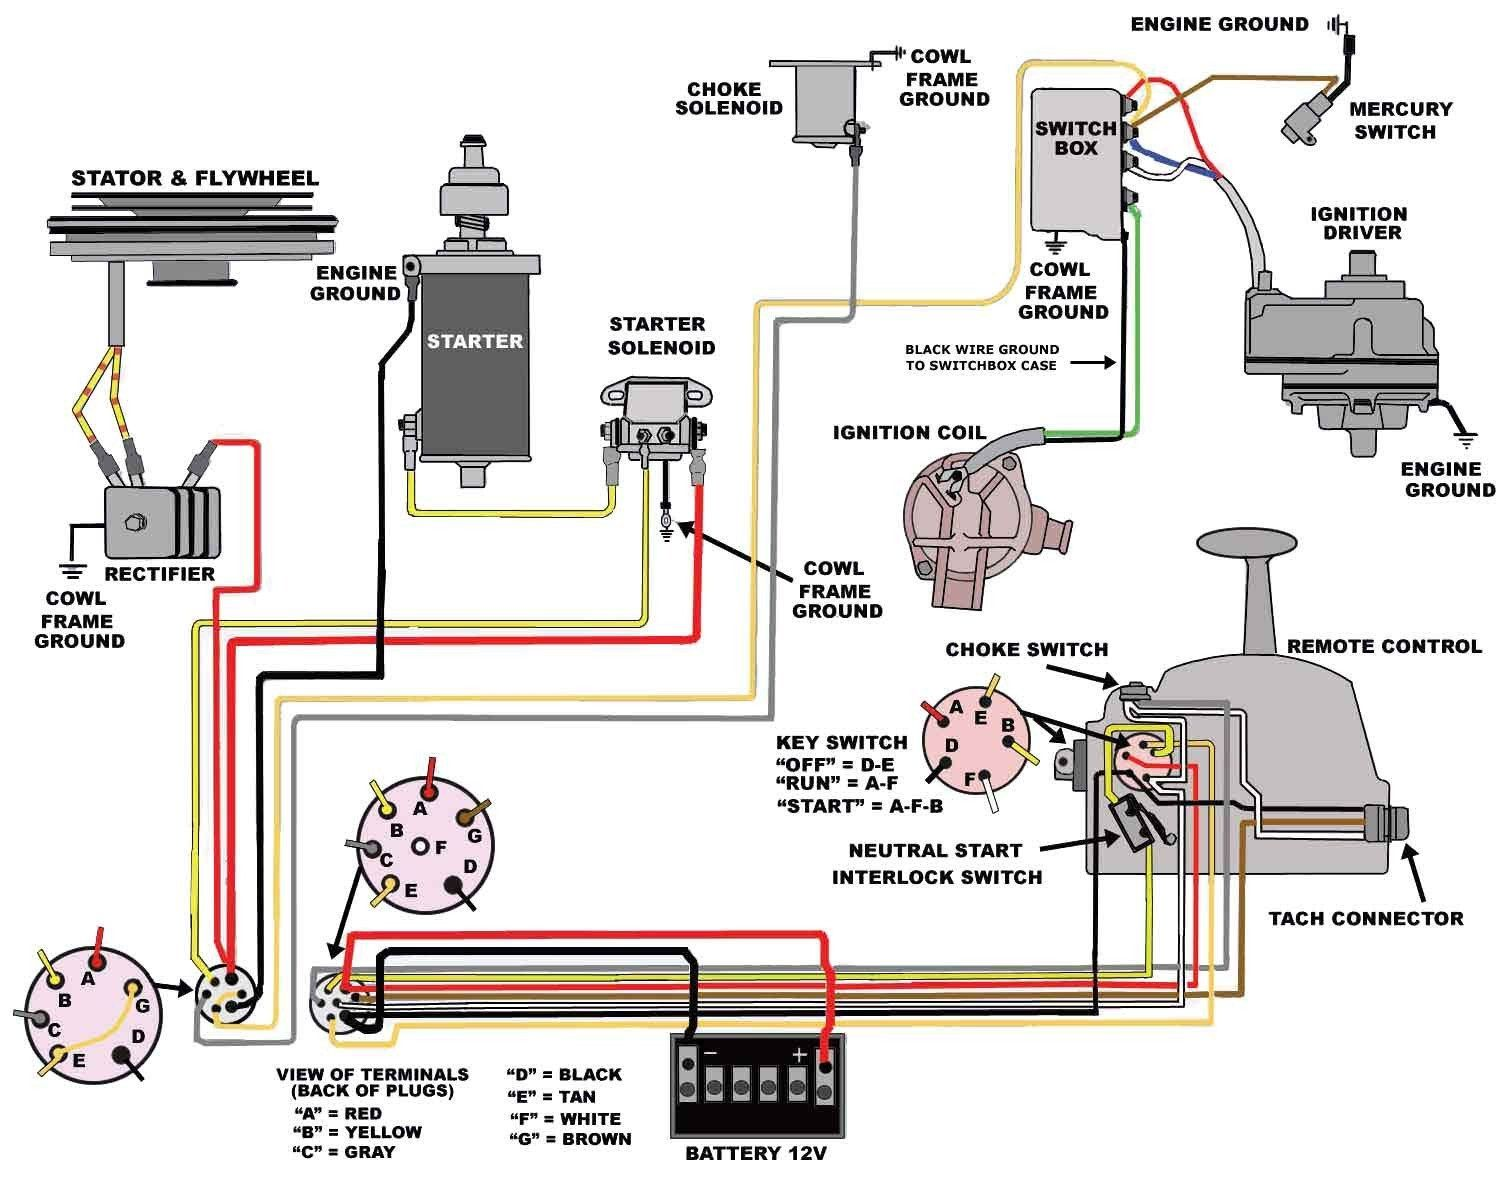 Mercury Boat Motor Wiring Diagram 1992